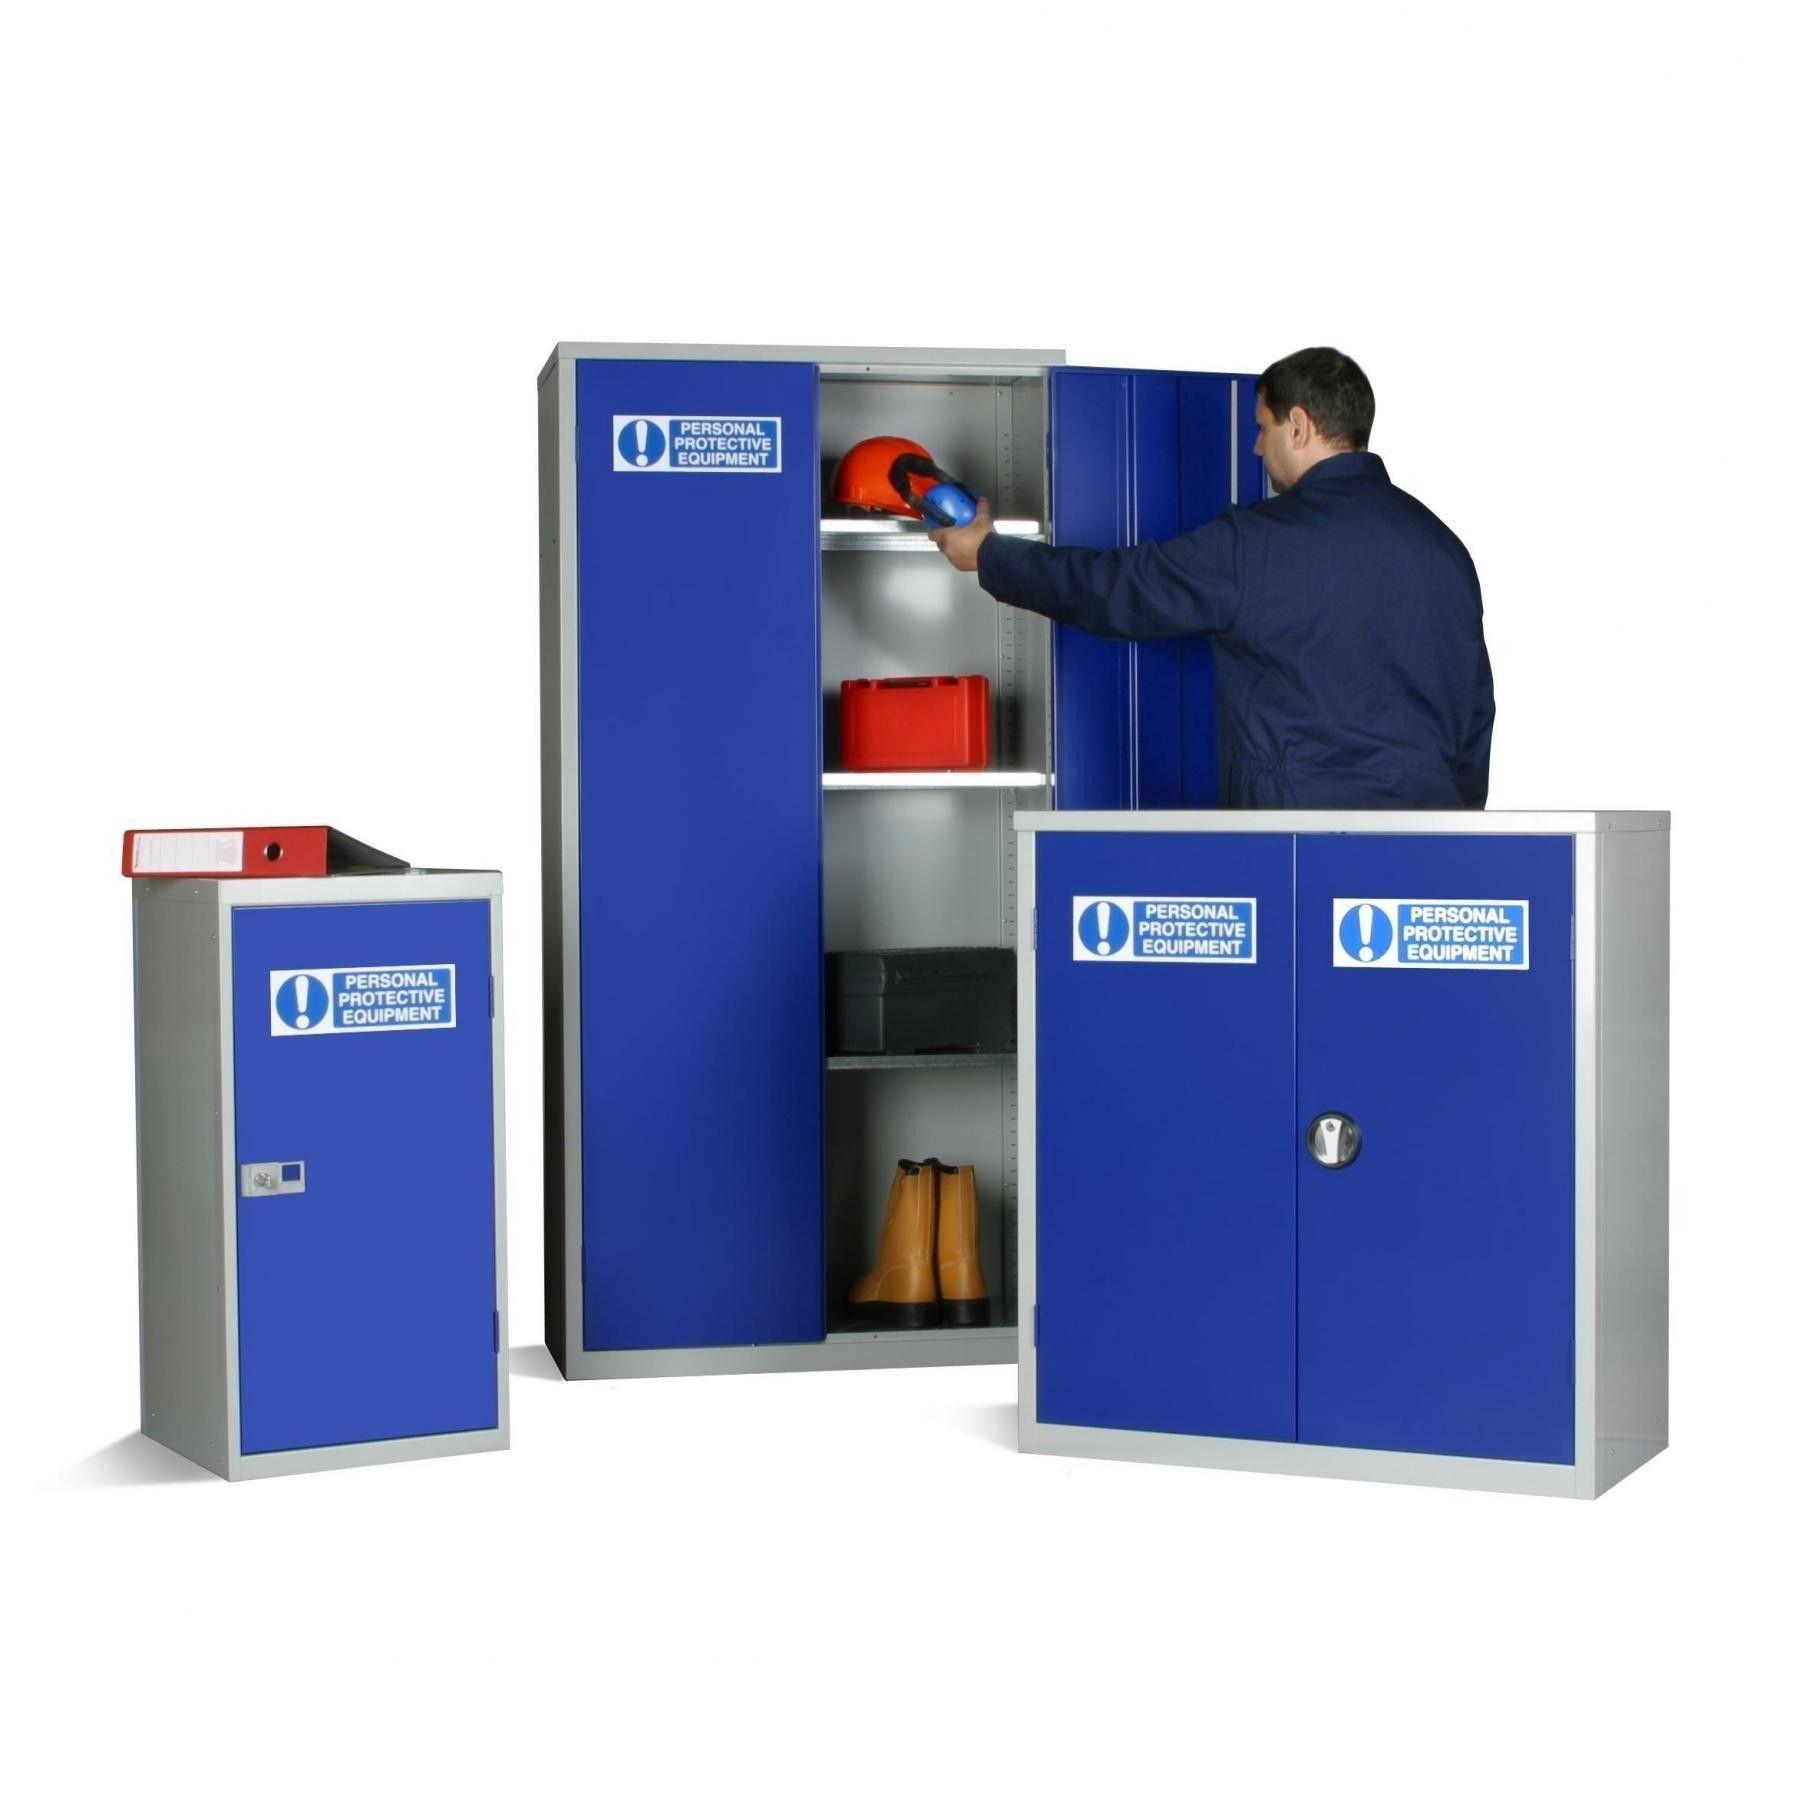 Large Ppe Storage Cabinet  sc 1 st  Pinterest & Large Ppe Storage Cabinet | http:/ulgamaisweb.com | Pinterest ...